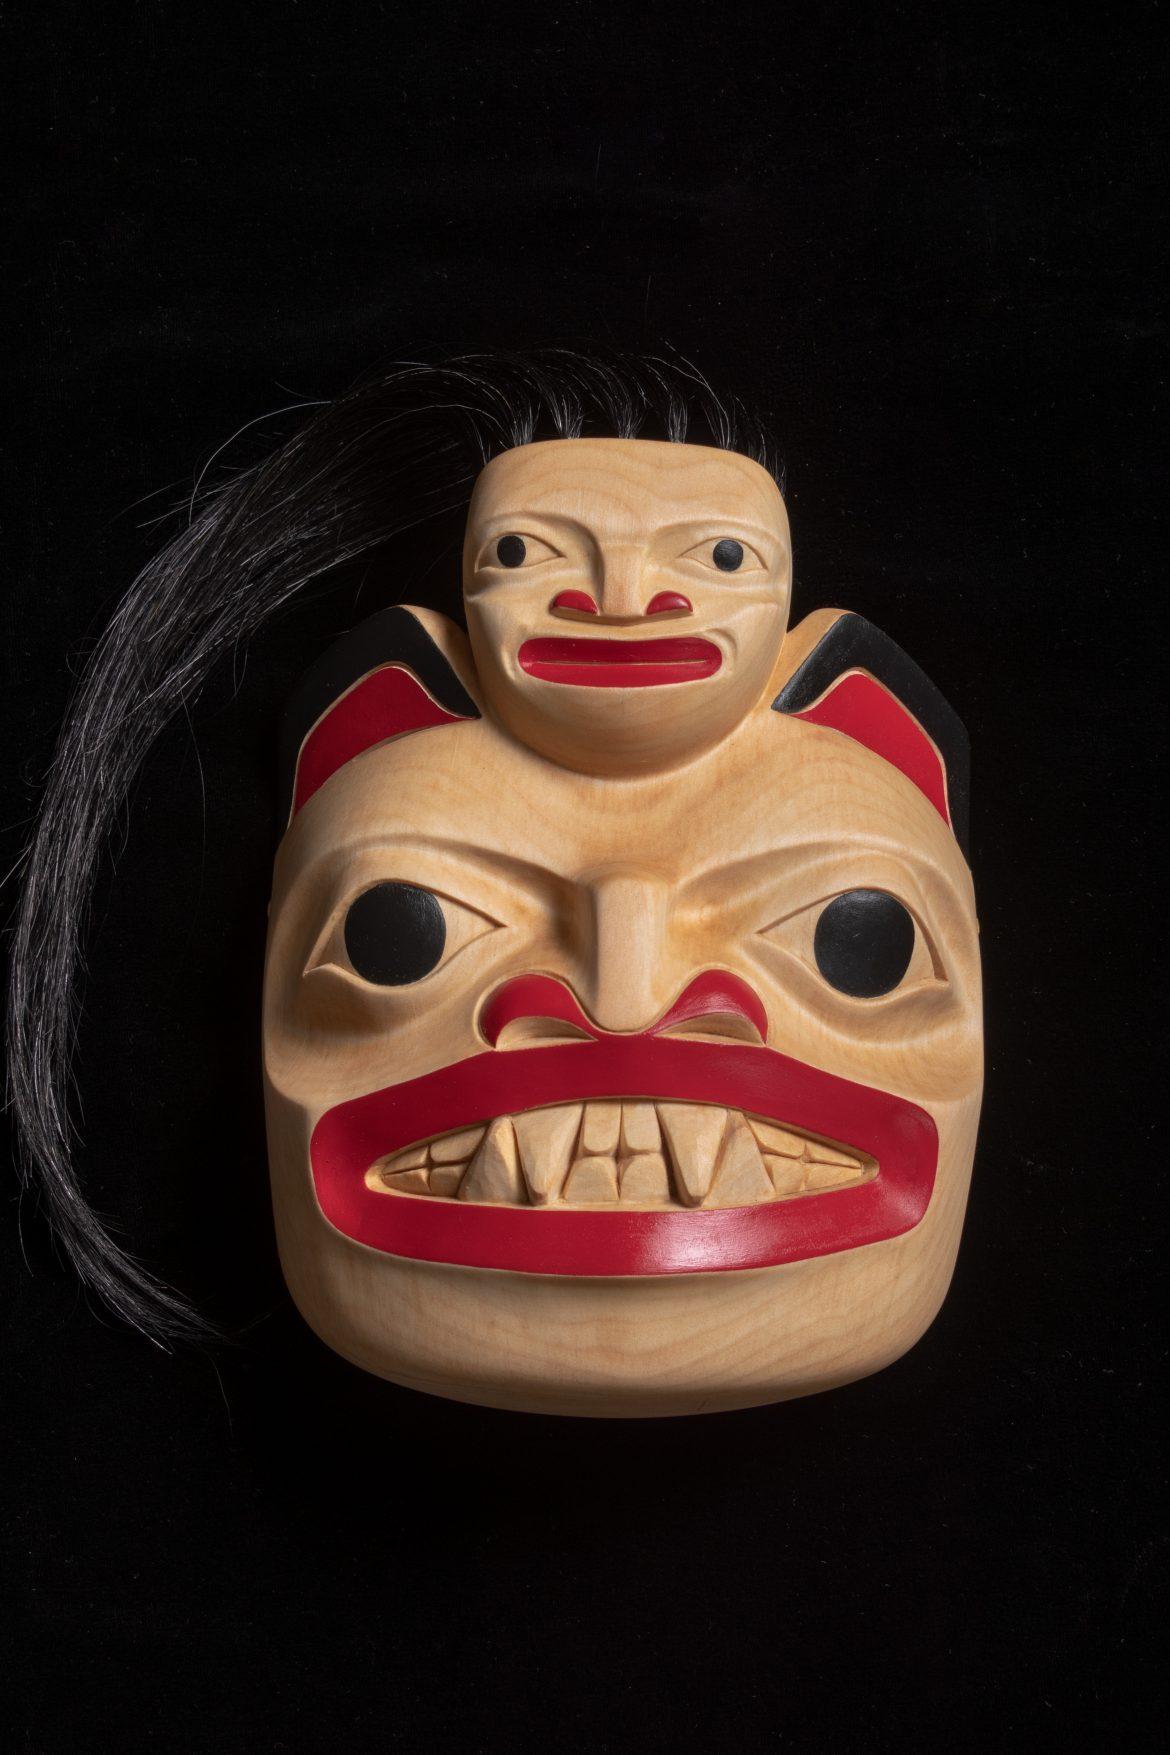 Cedar carving artwork by Yukon Artist Lorraine M Wolfe